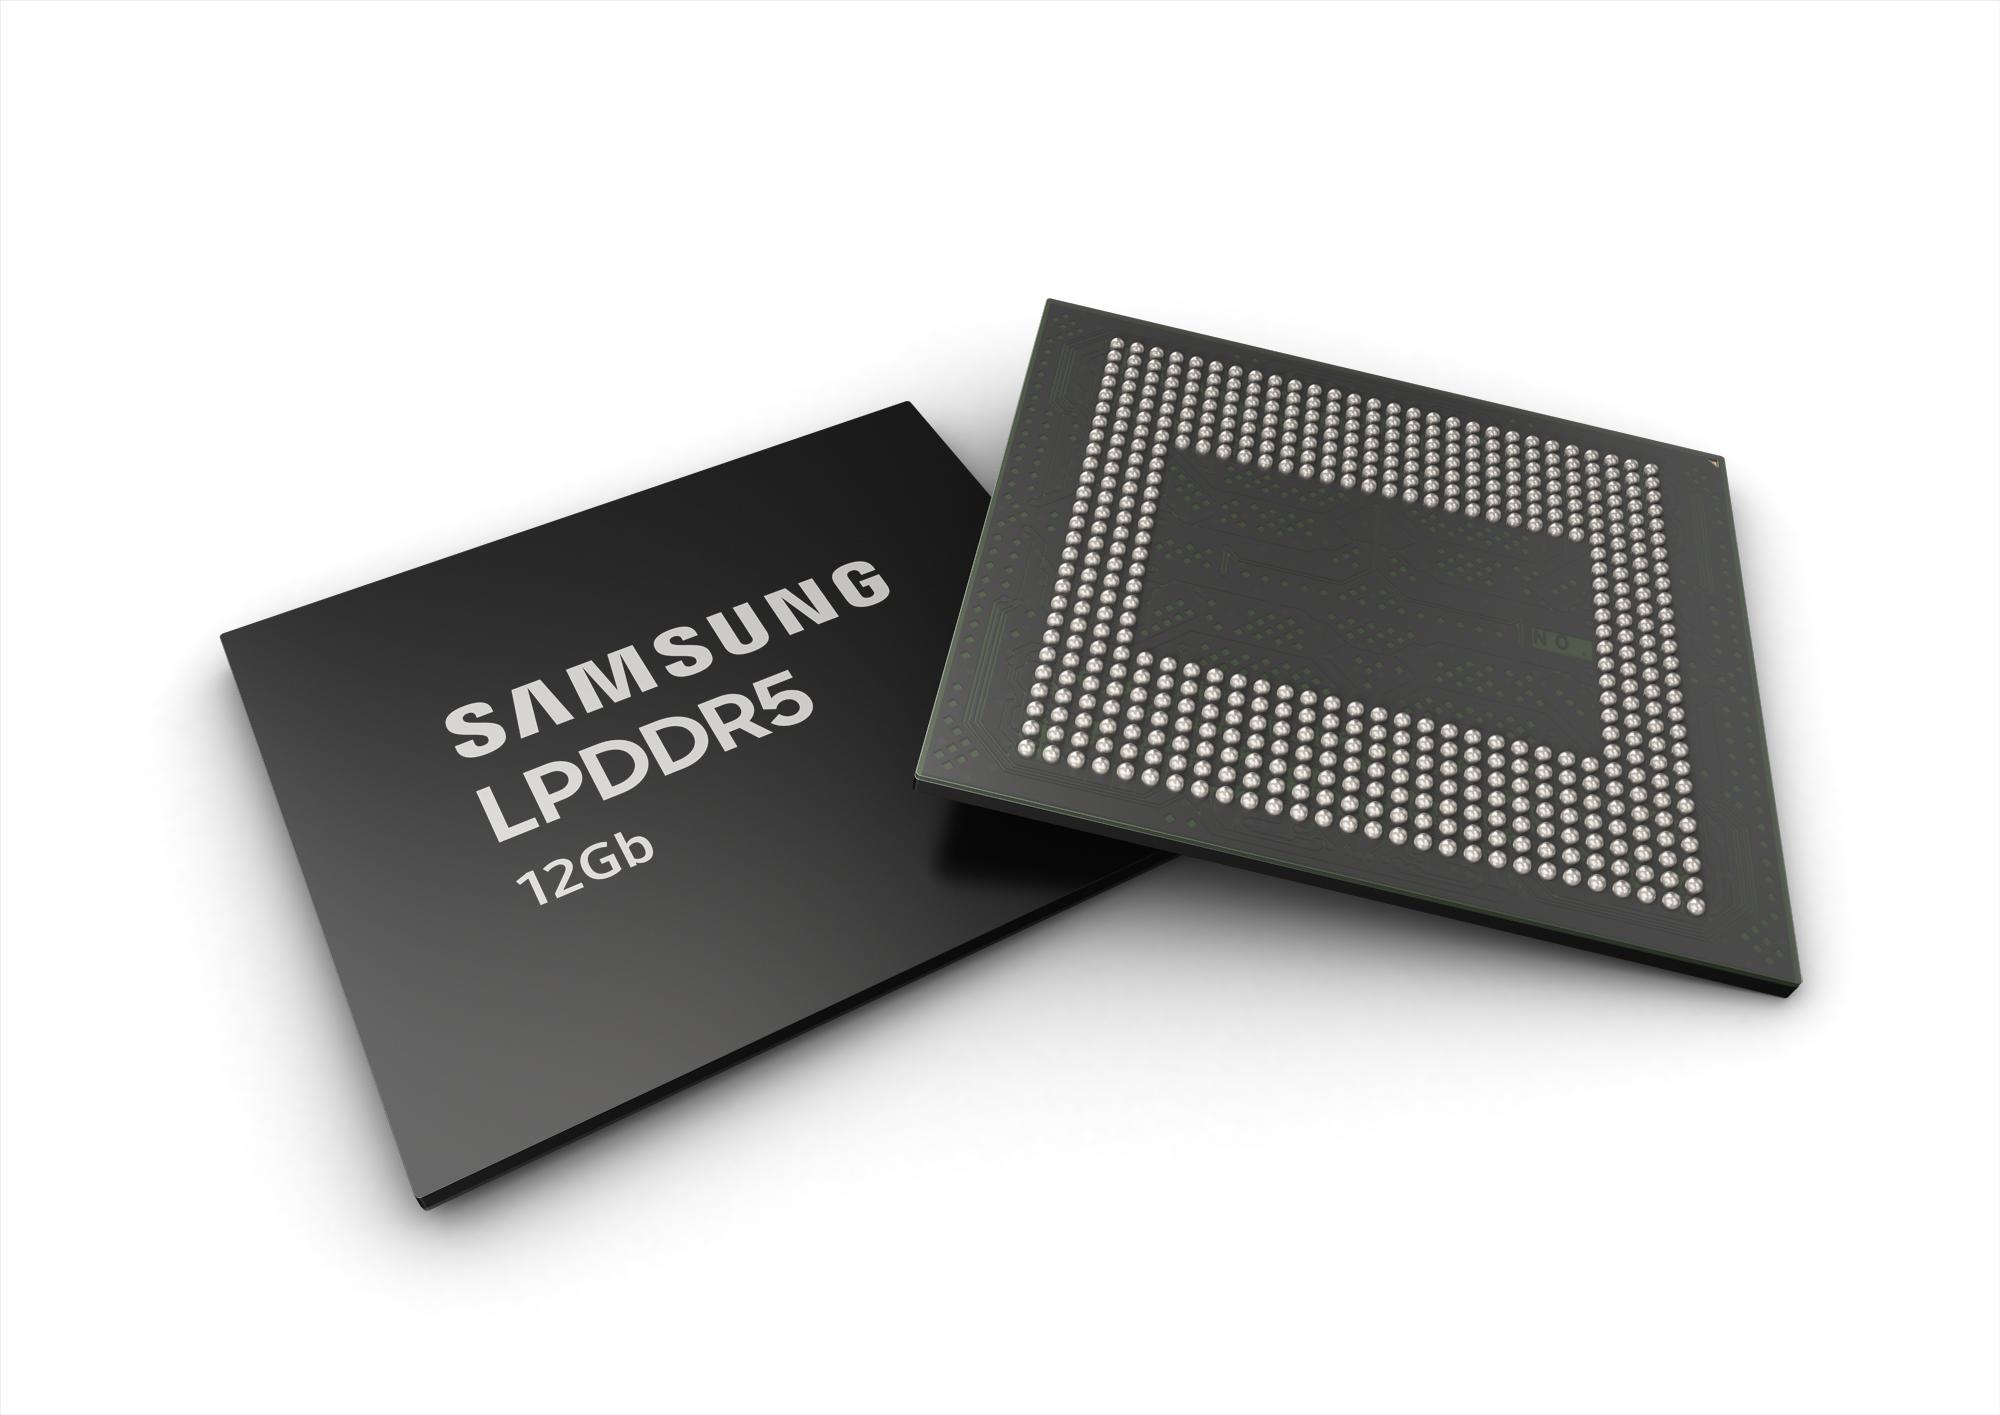 Samsung, Hynix, Silicon Image разрабатывают новый стандарт памяти DRAM.